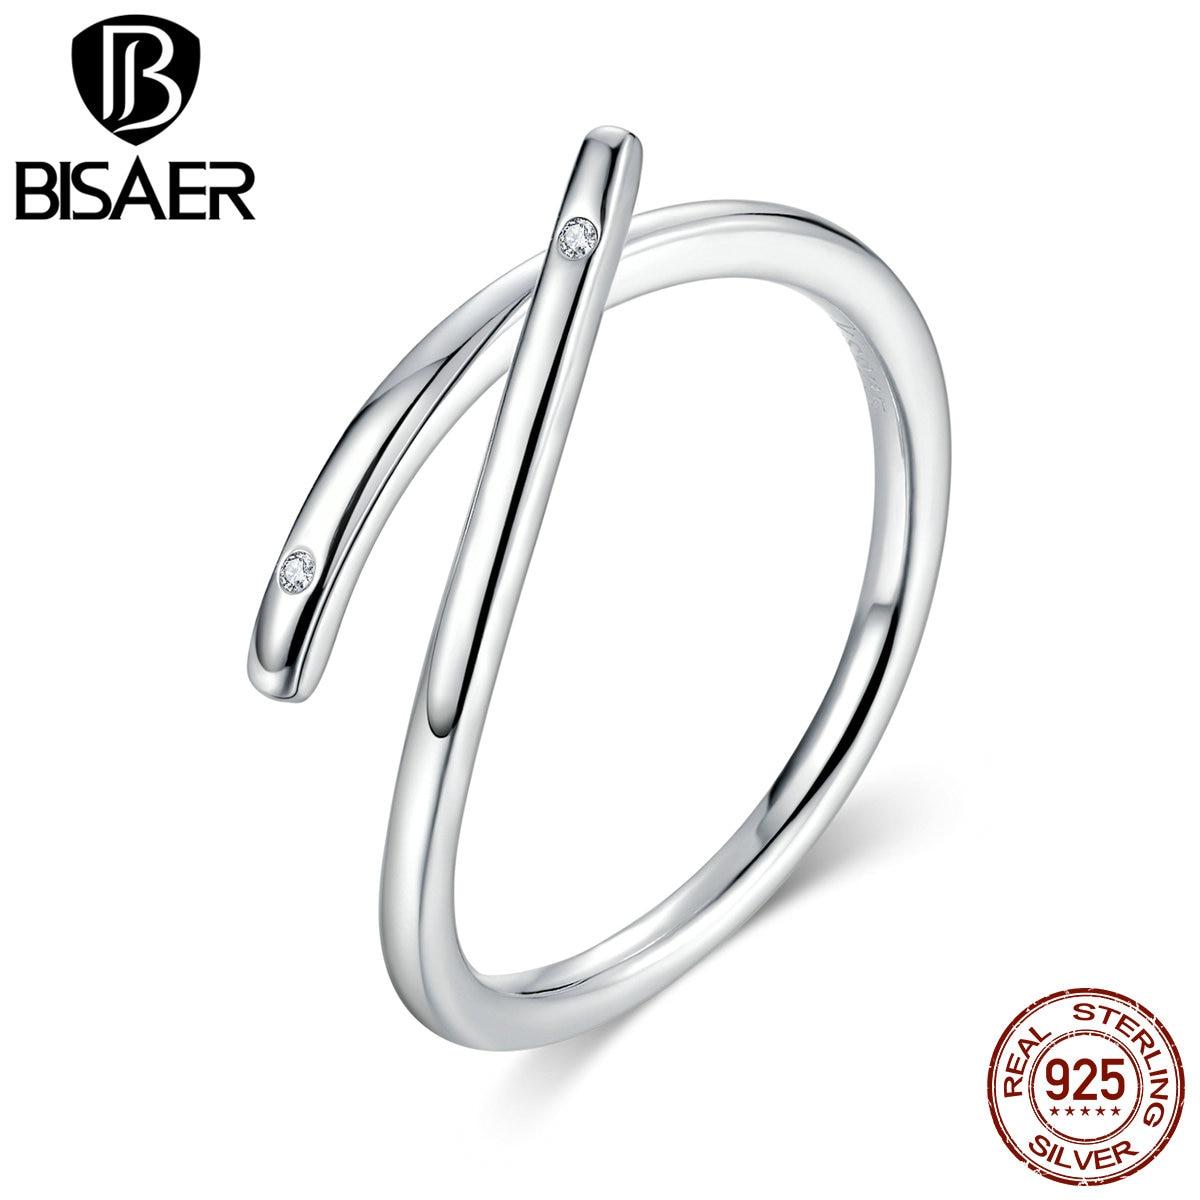 Adjustable Sterling Silver Zircon Cross Ring